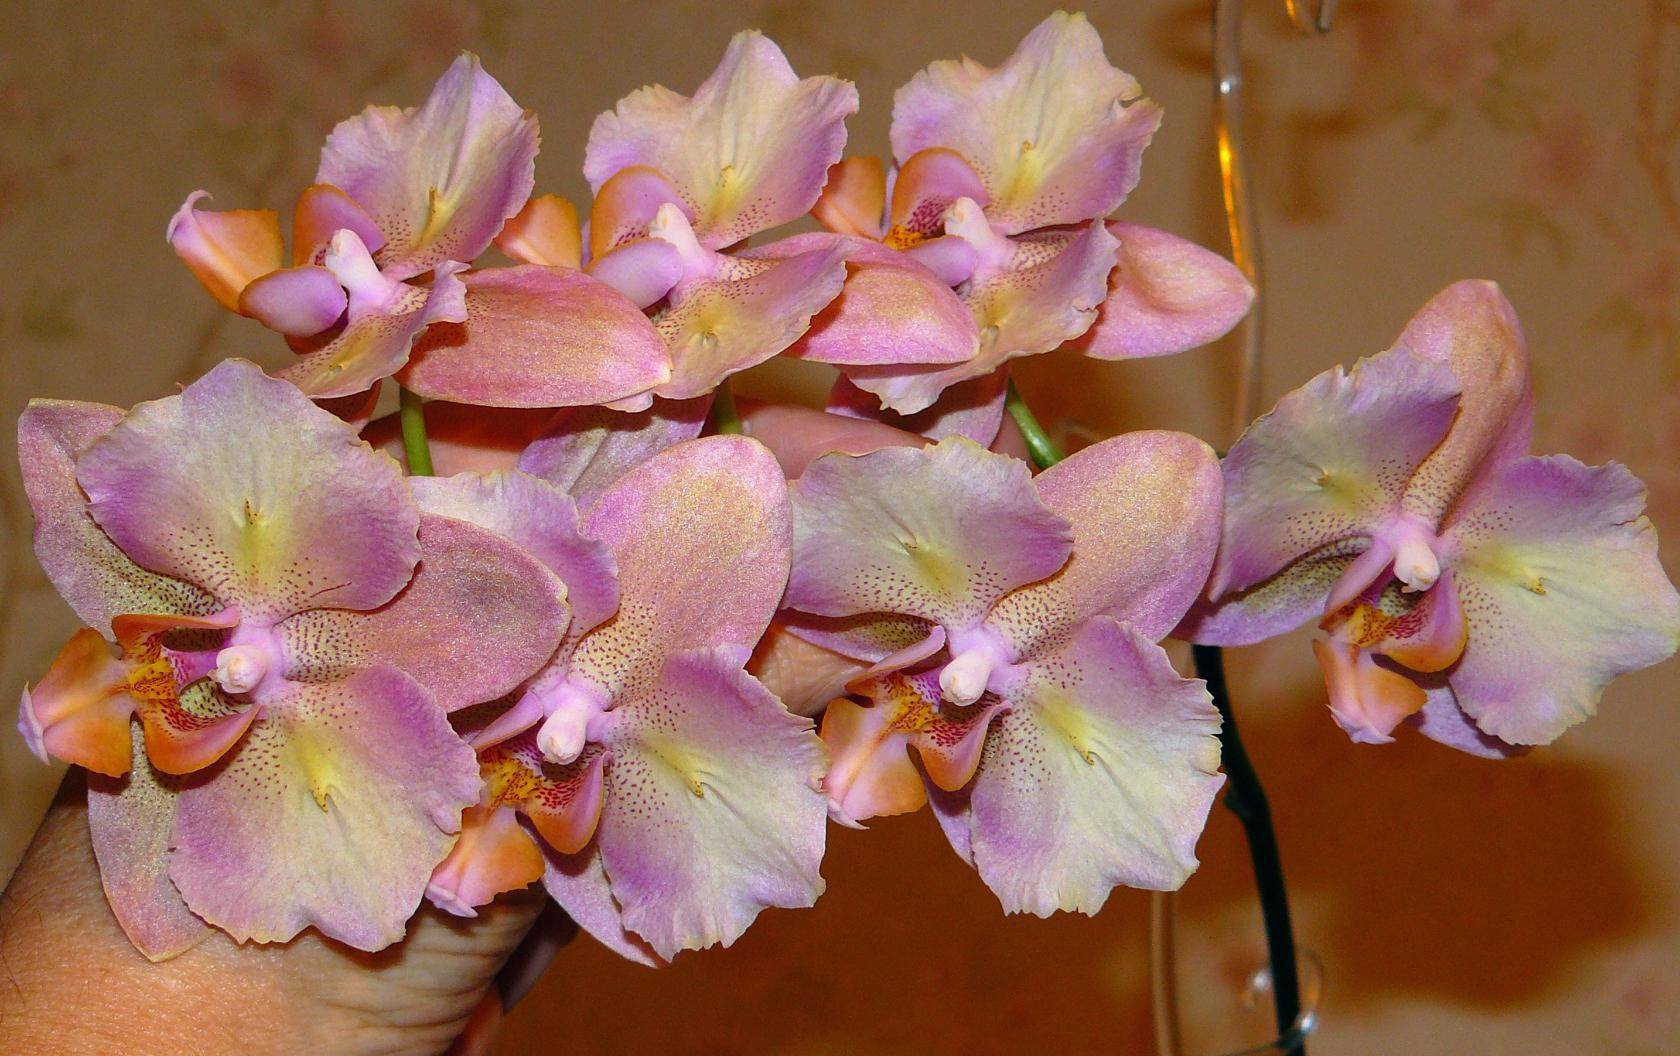 Фаленопсис нарбонна: все о сорте орхидеи с фото и описанием бутонов, а также уход в домашних условиях